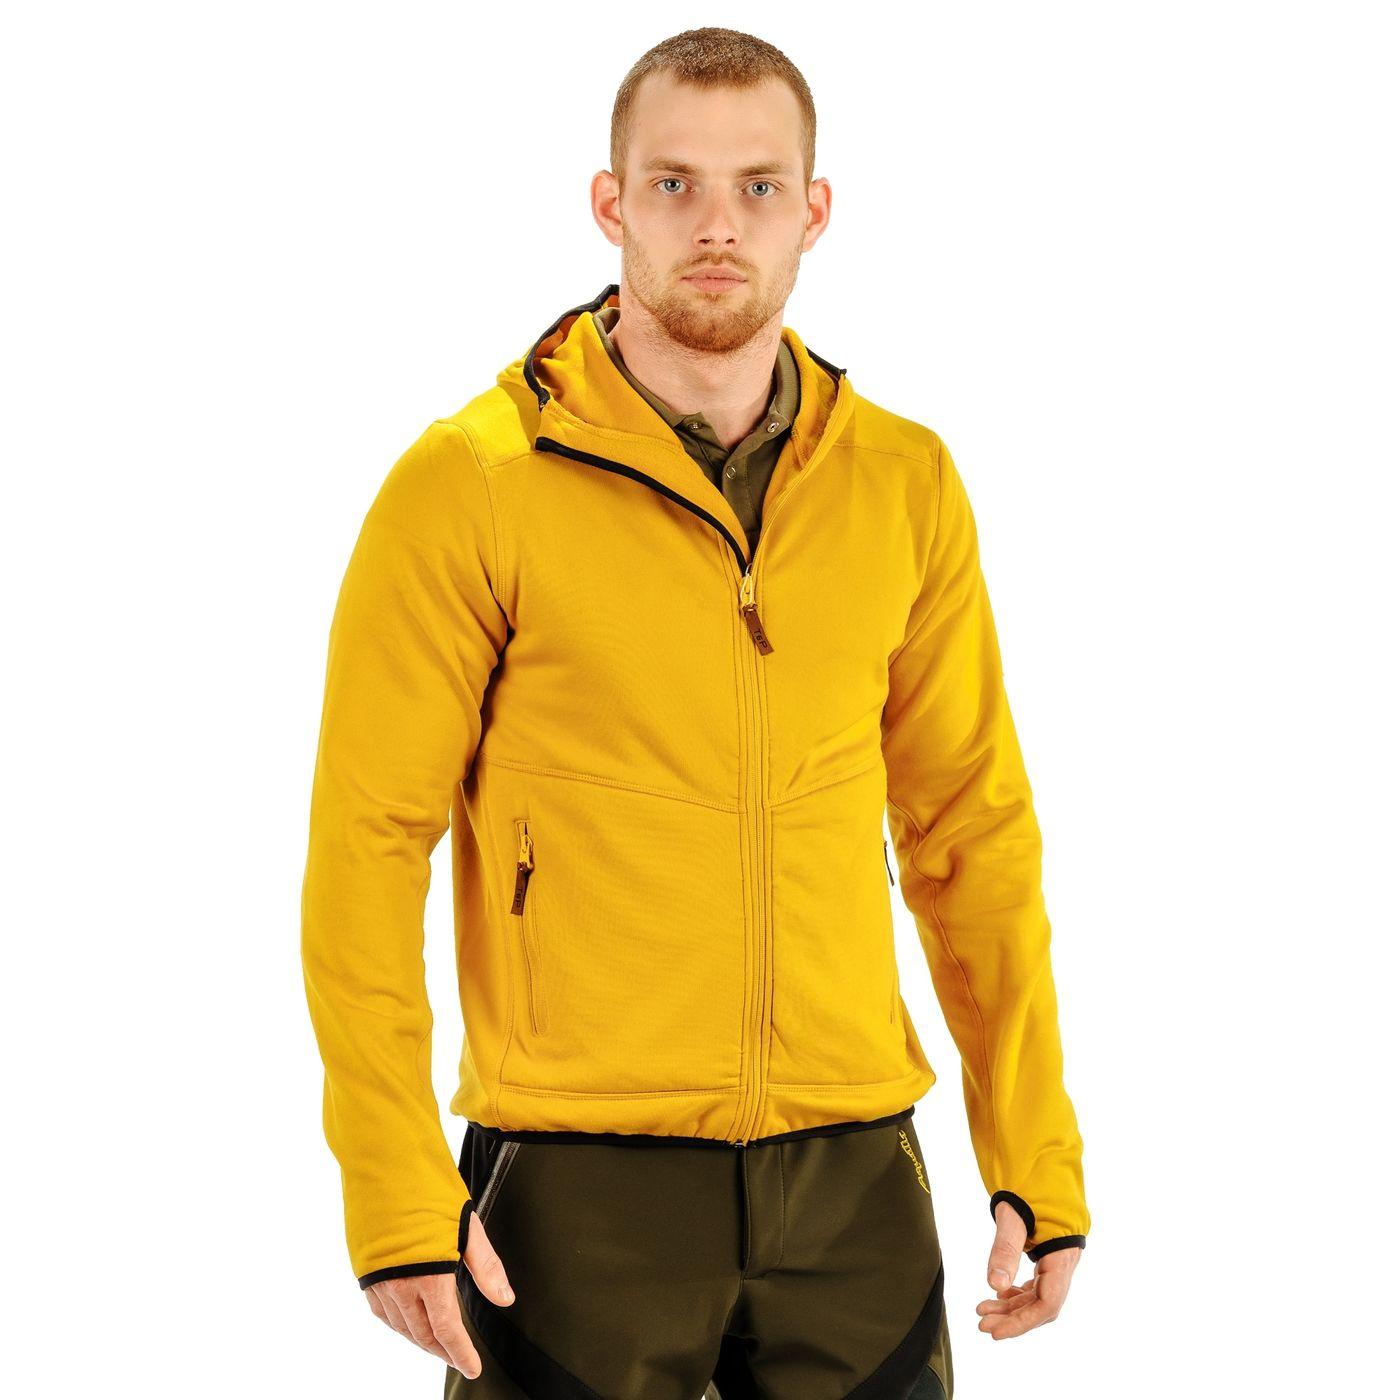 Fleece Jacket Fl-04, Yellow Fl-04 Yellow M